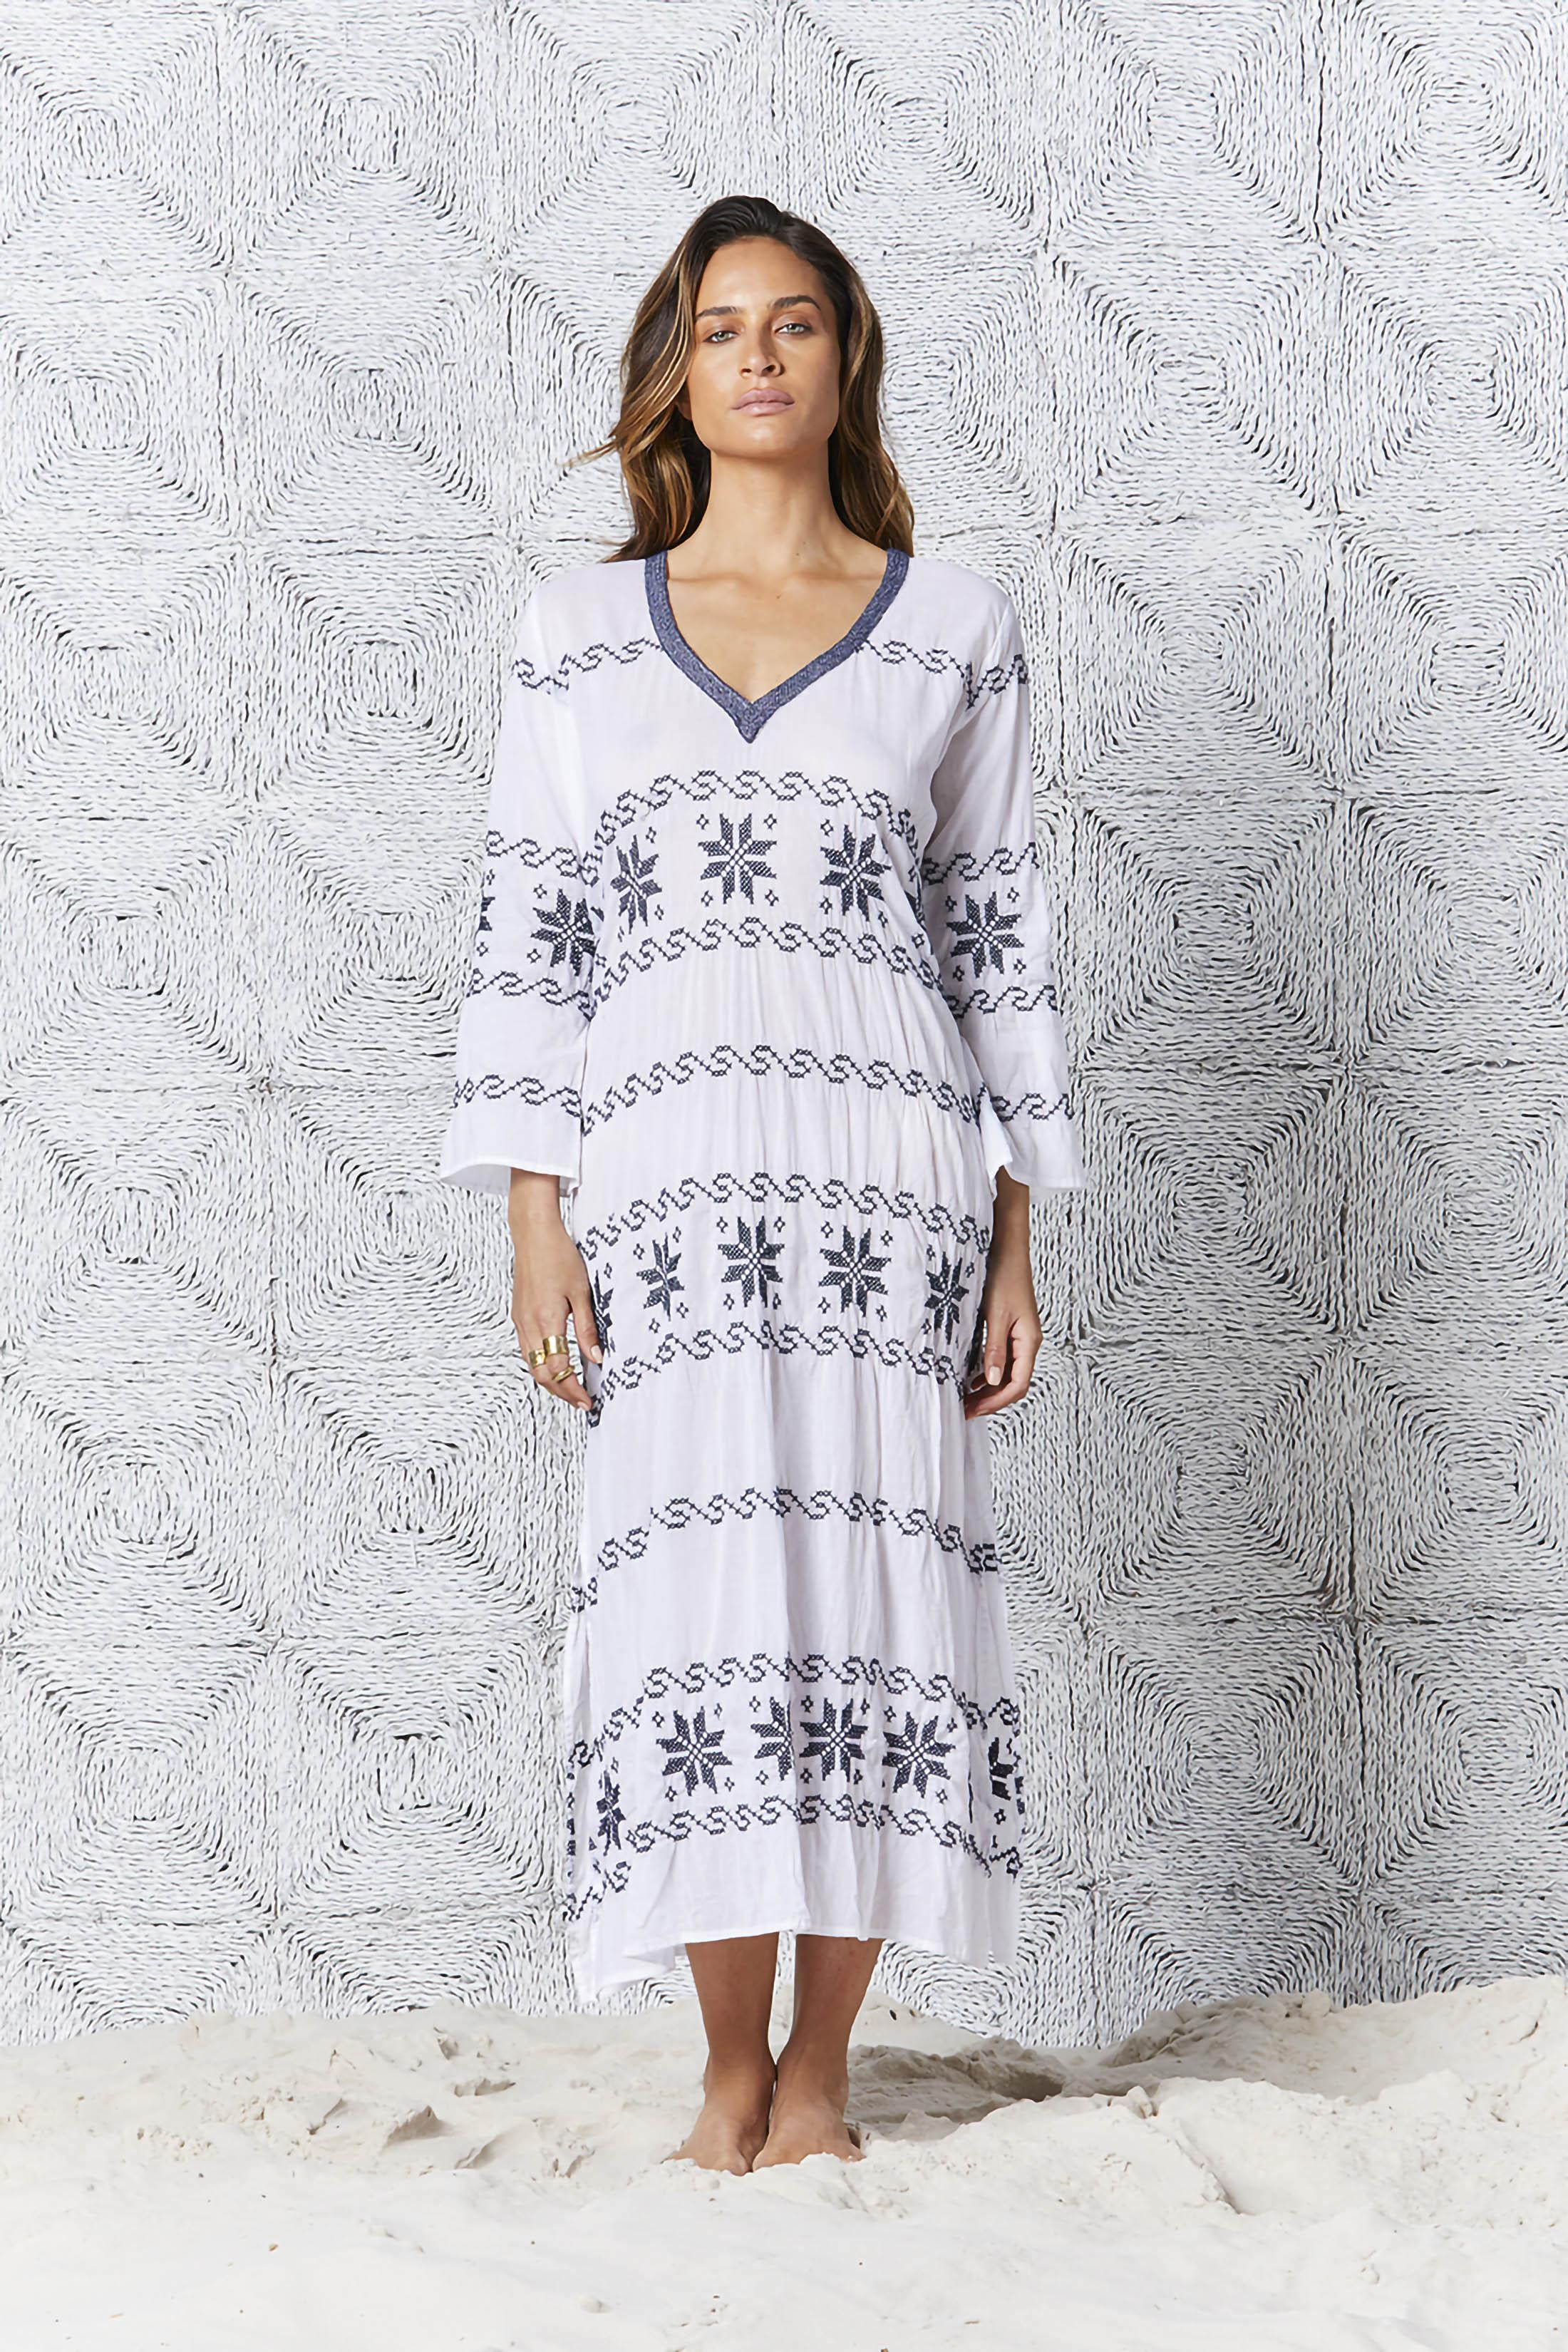 One Season Arabella - White/Navy Embroidery